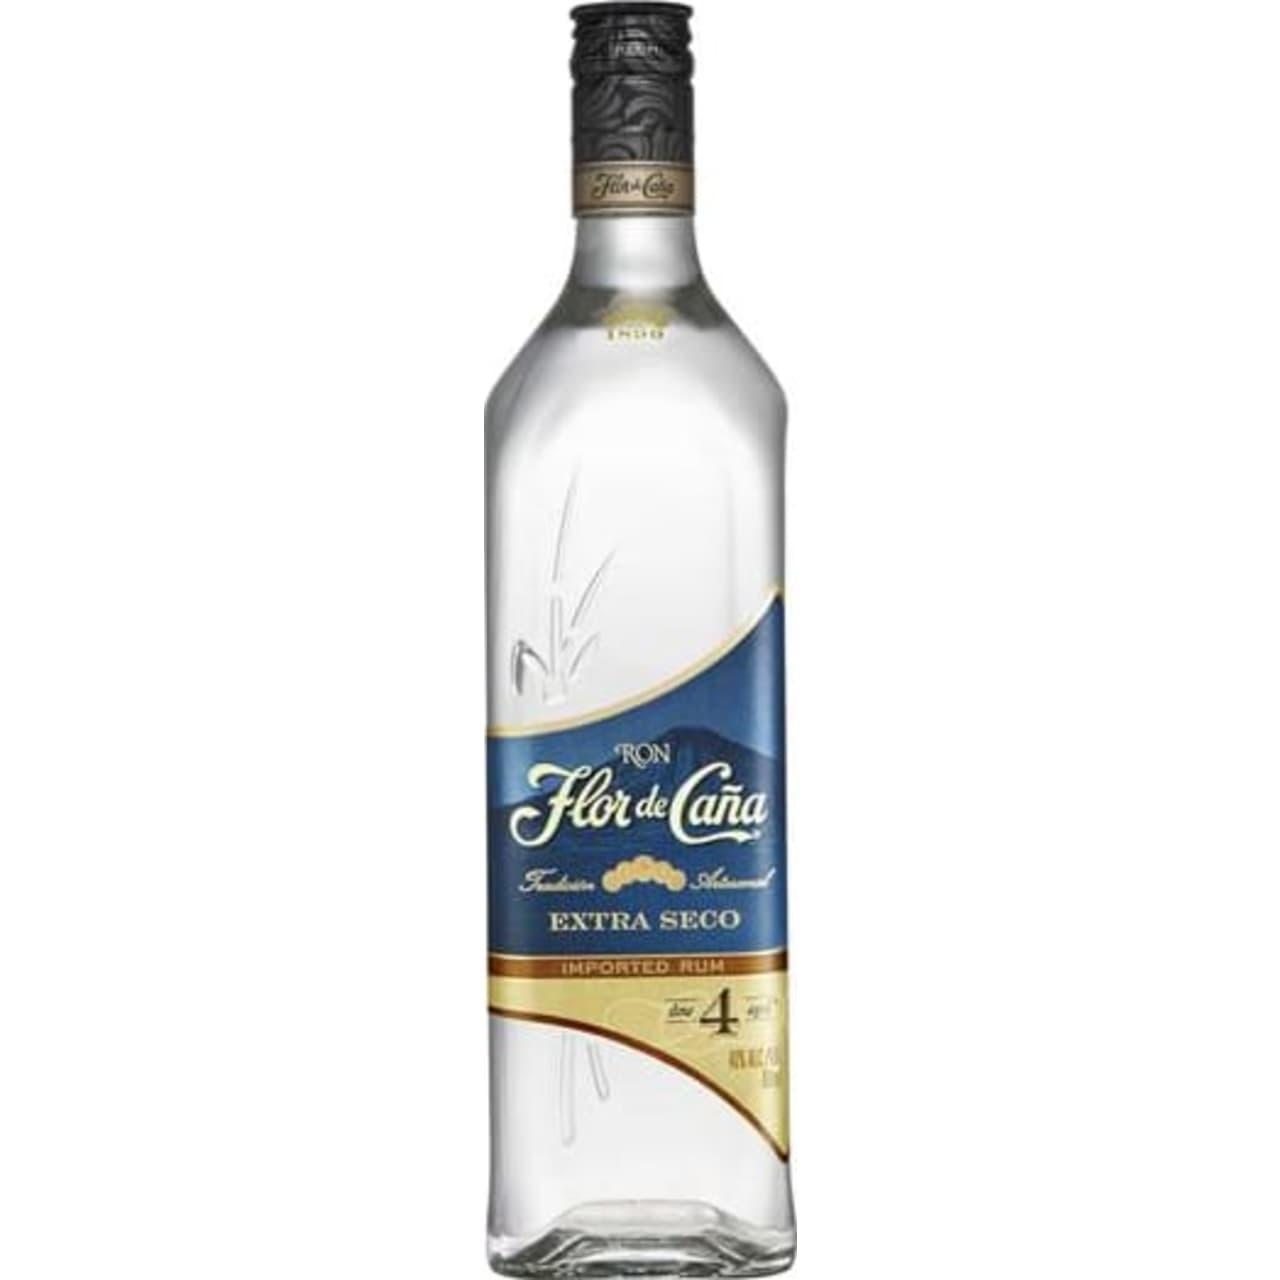 Product Image - Flor de Caña 4yo Extra Dry Rum